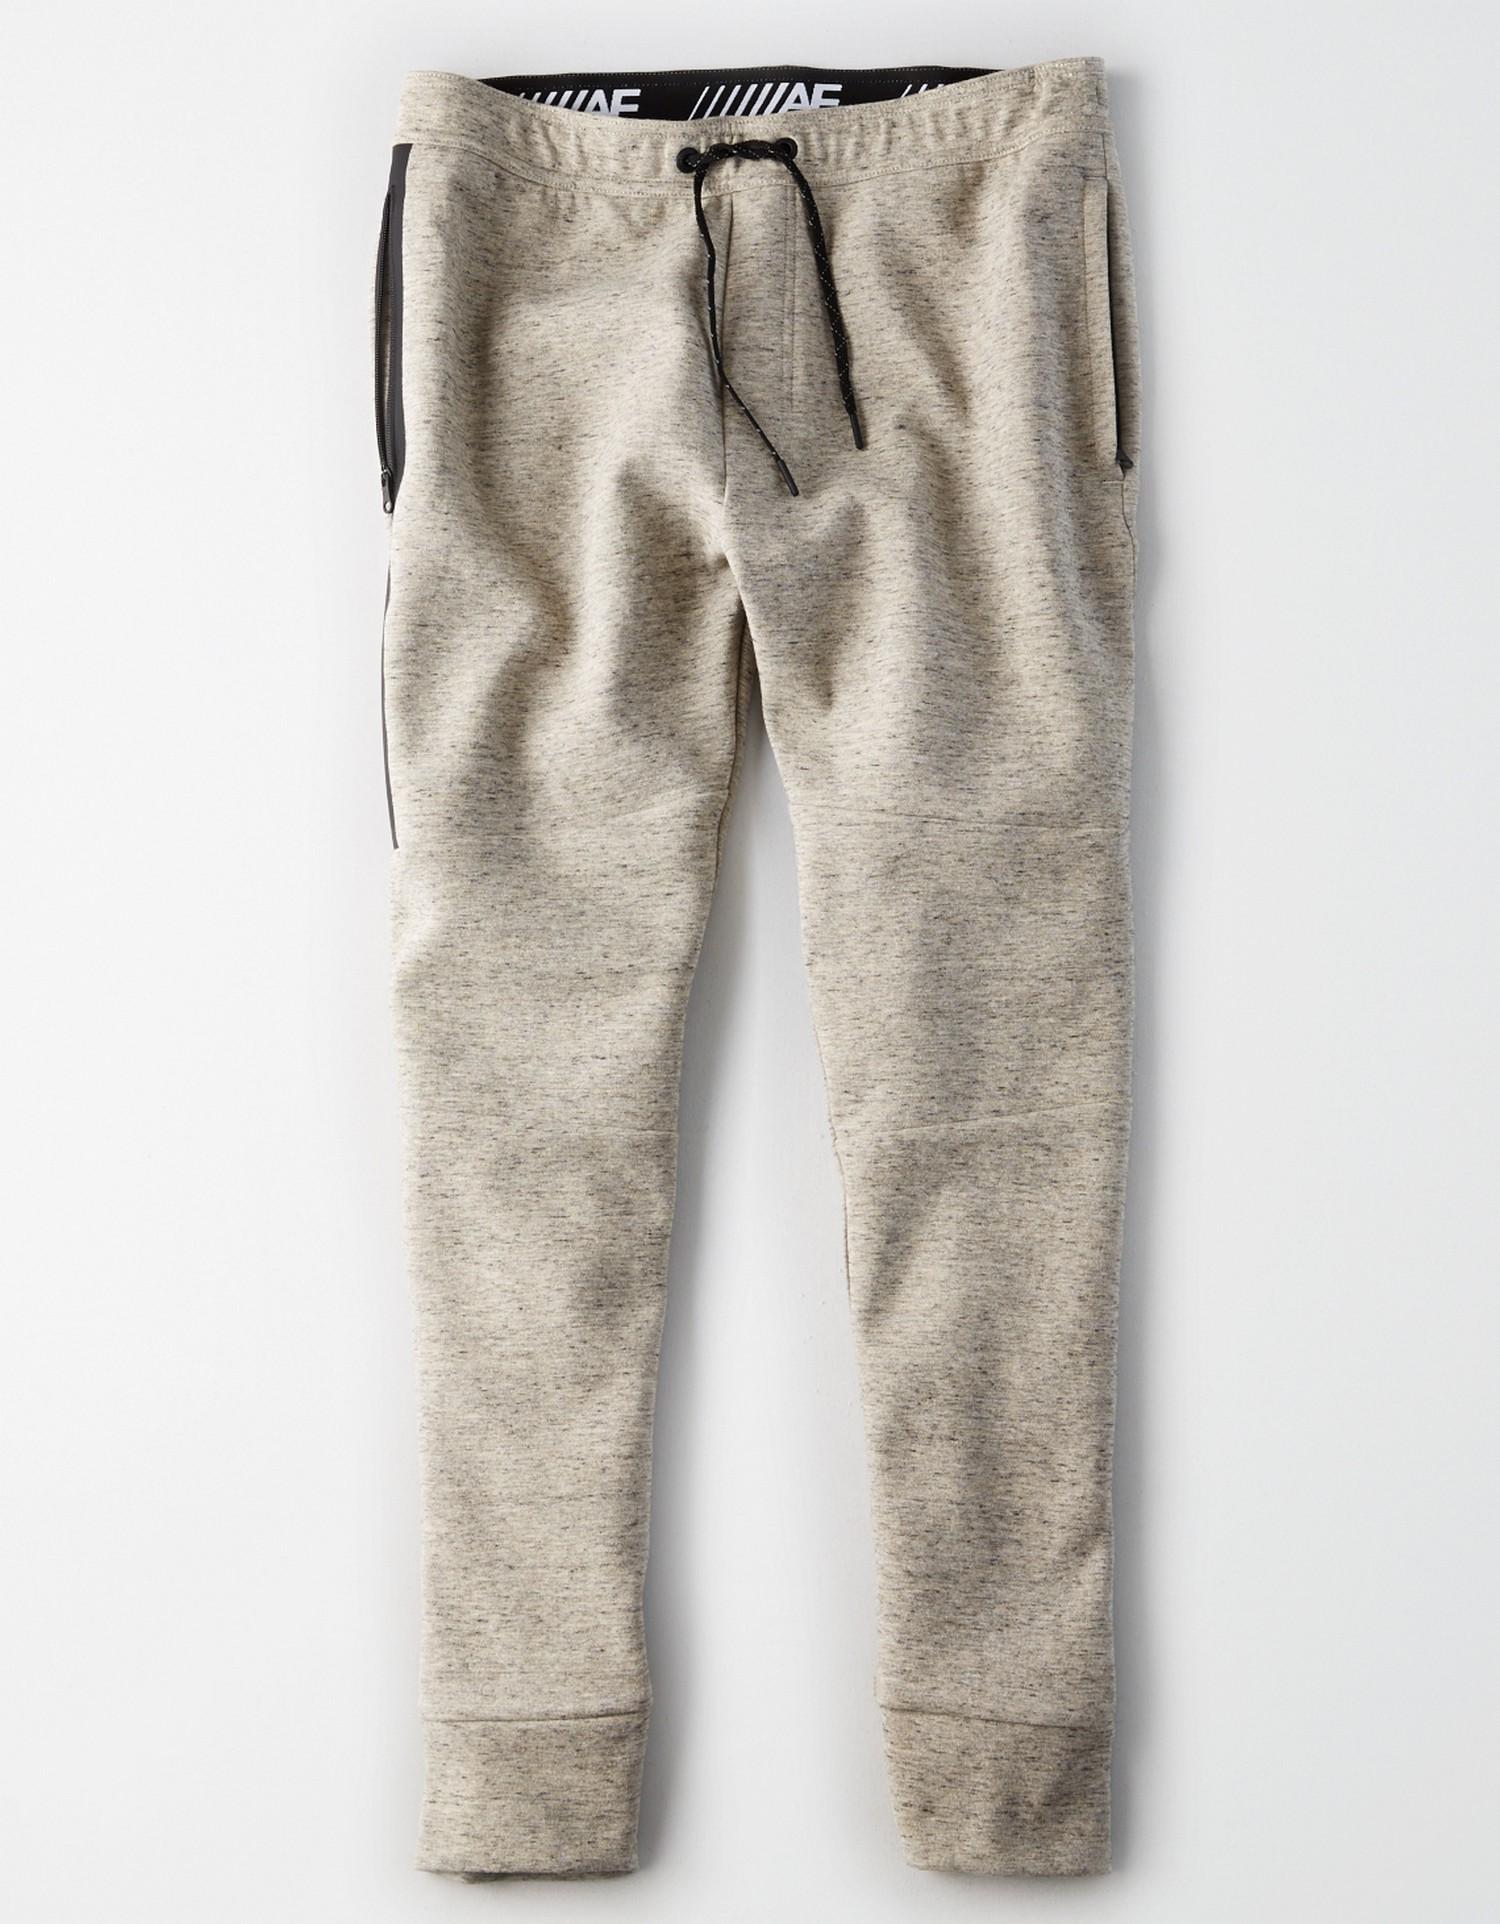 AE - W - Apparel - FLEECE JOGGER - ISSAC Heather Grey - Black Zipper Back Pocket - Black drawstring on waist AL